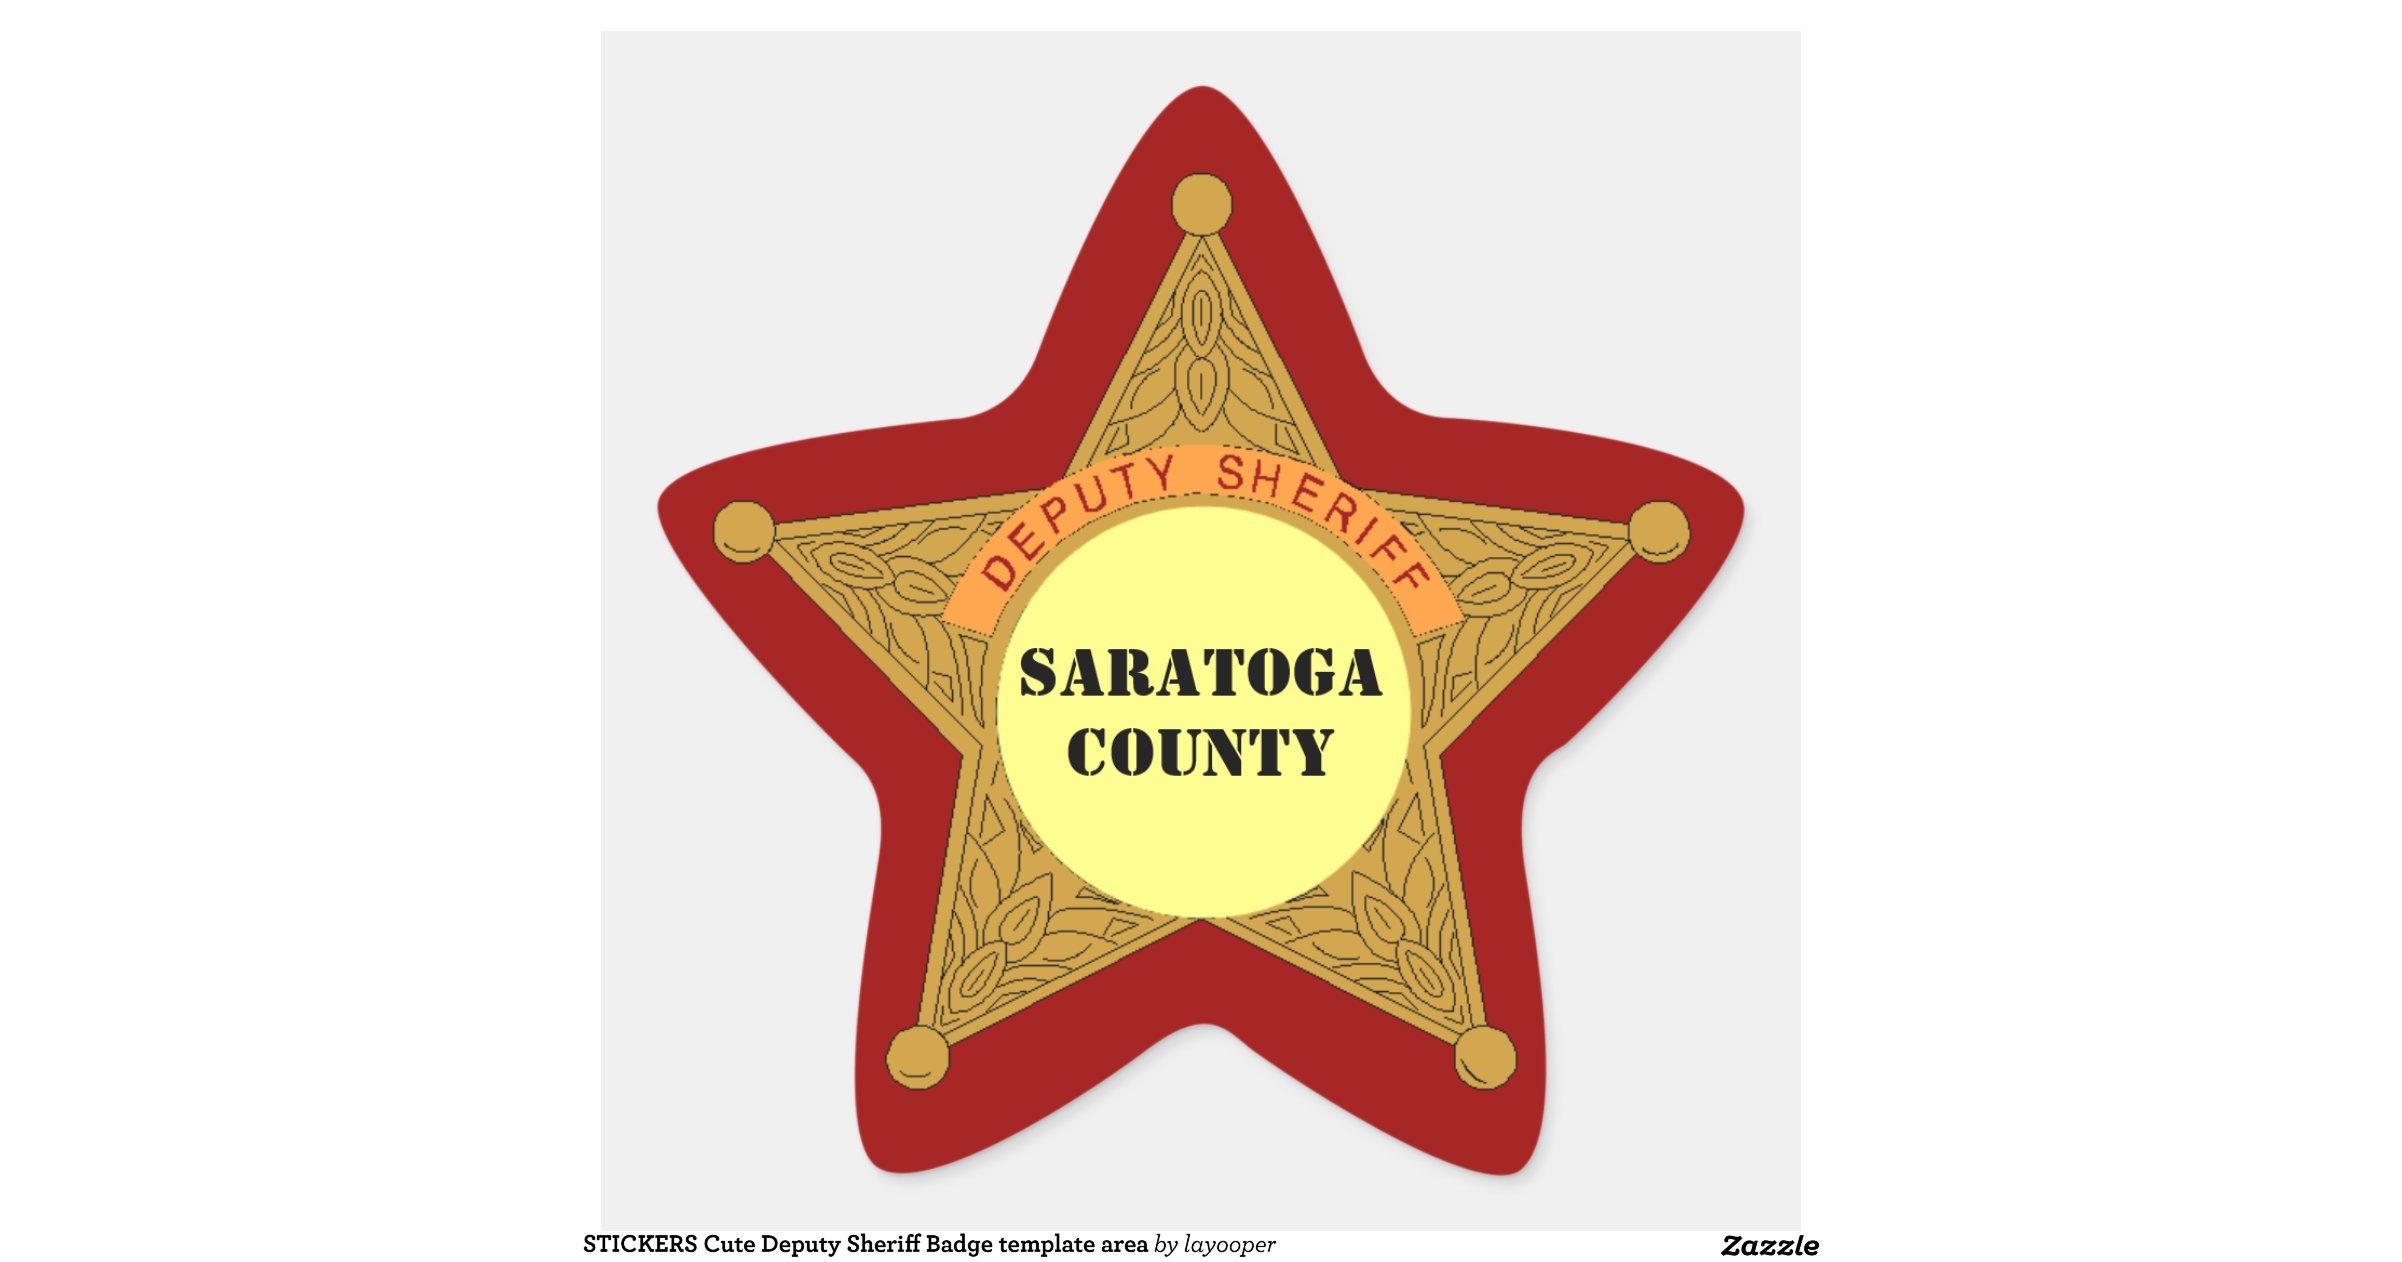 stickers_cute_deputy_sheriff_badge_template_area ...